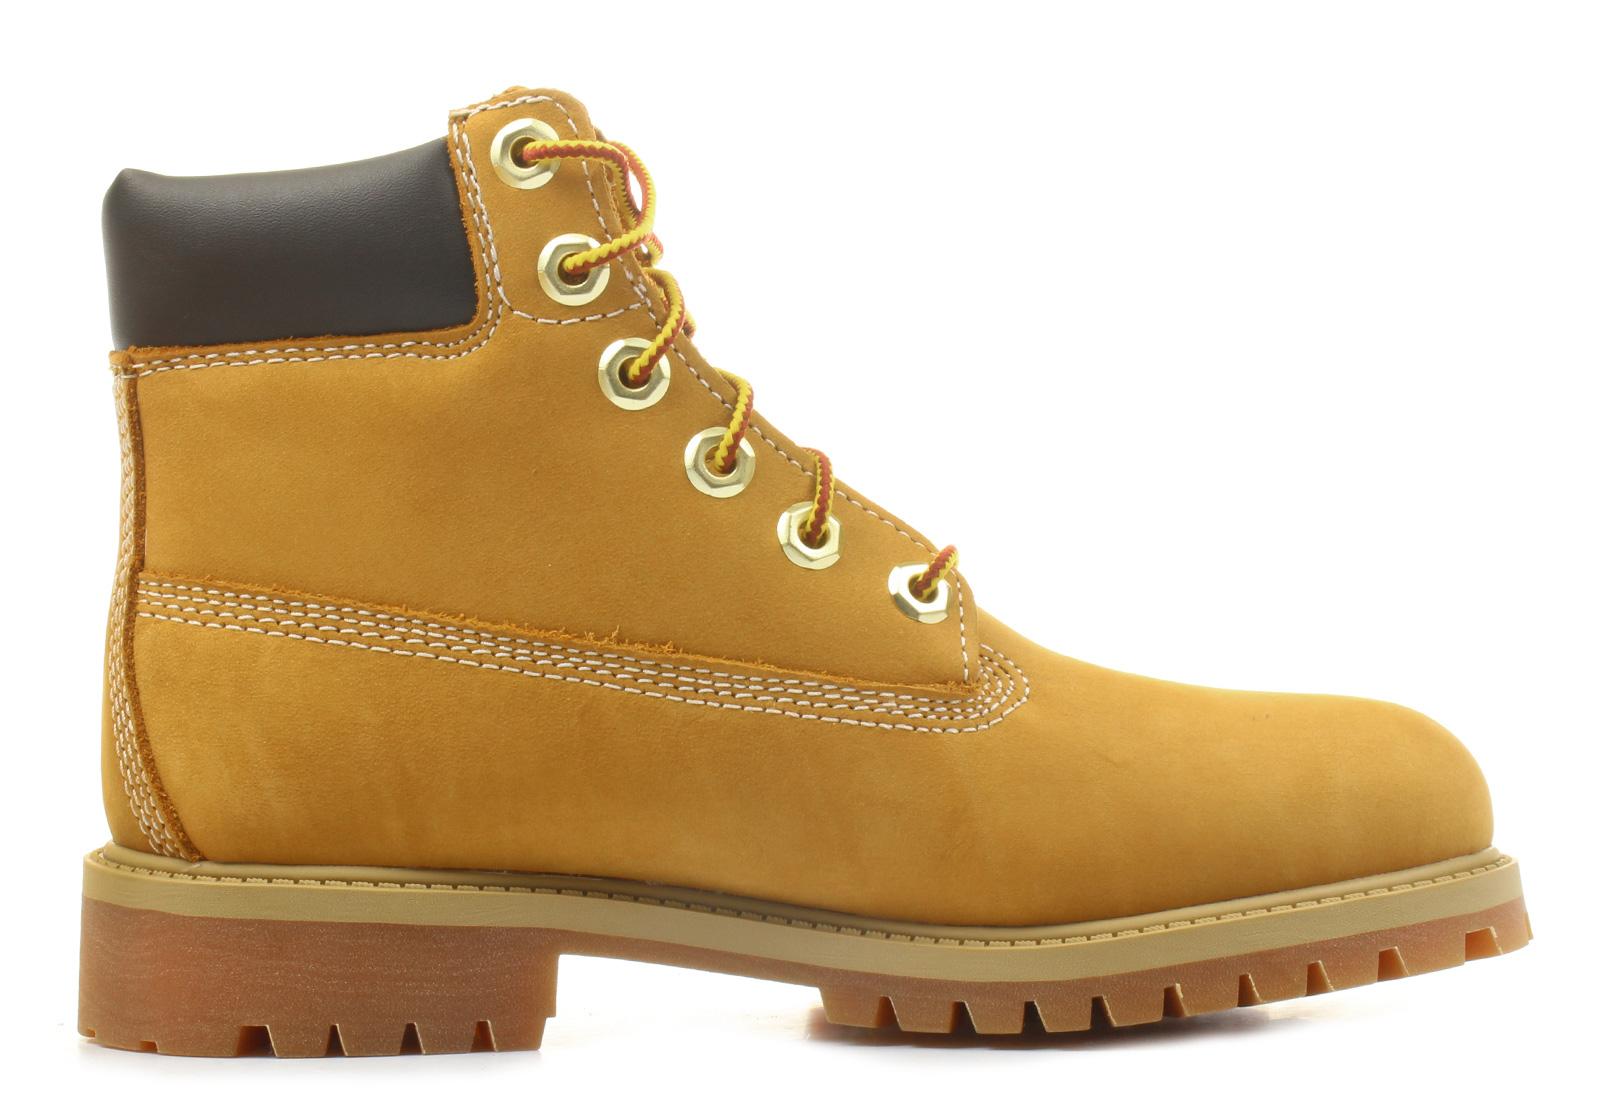 Timberland Boty Farmářky - 6 inch Premium Boot - 12909-WHETenisky ... 00ed046df09